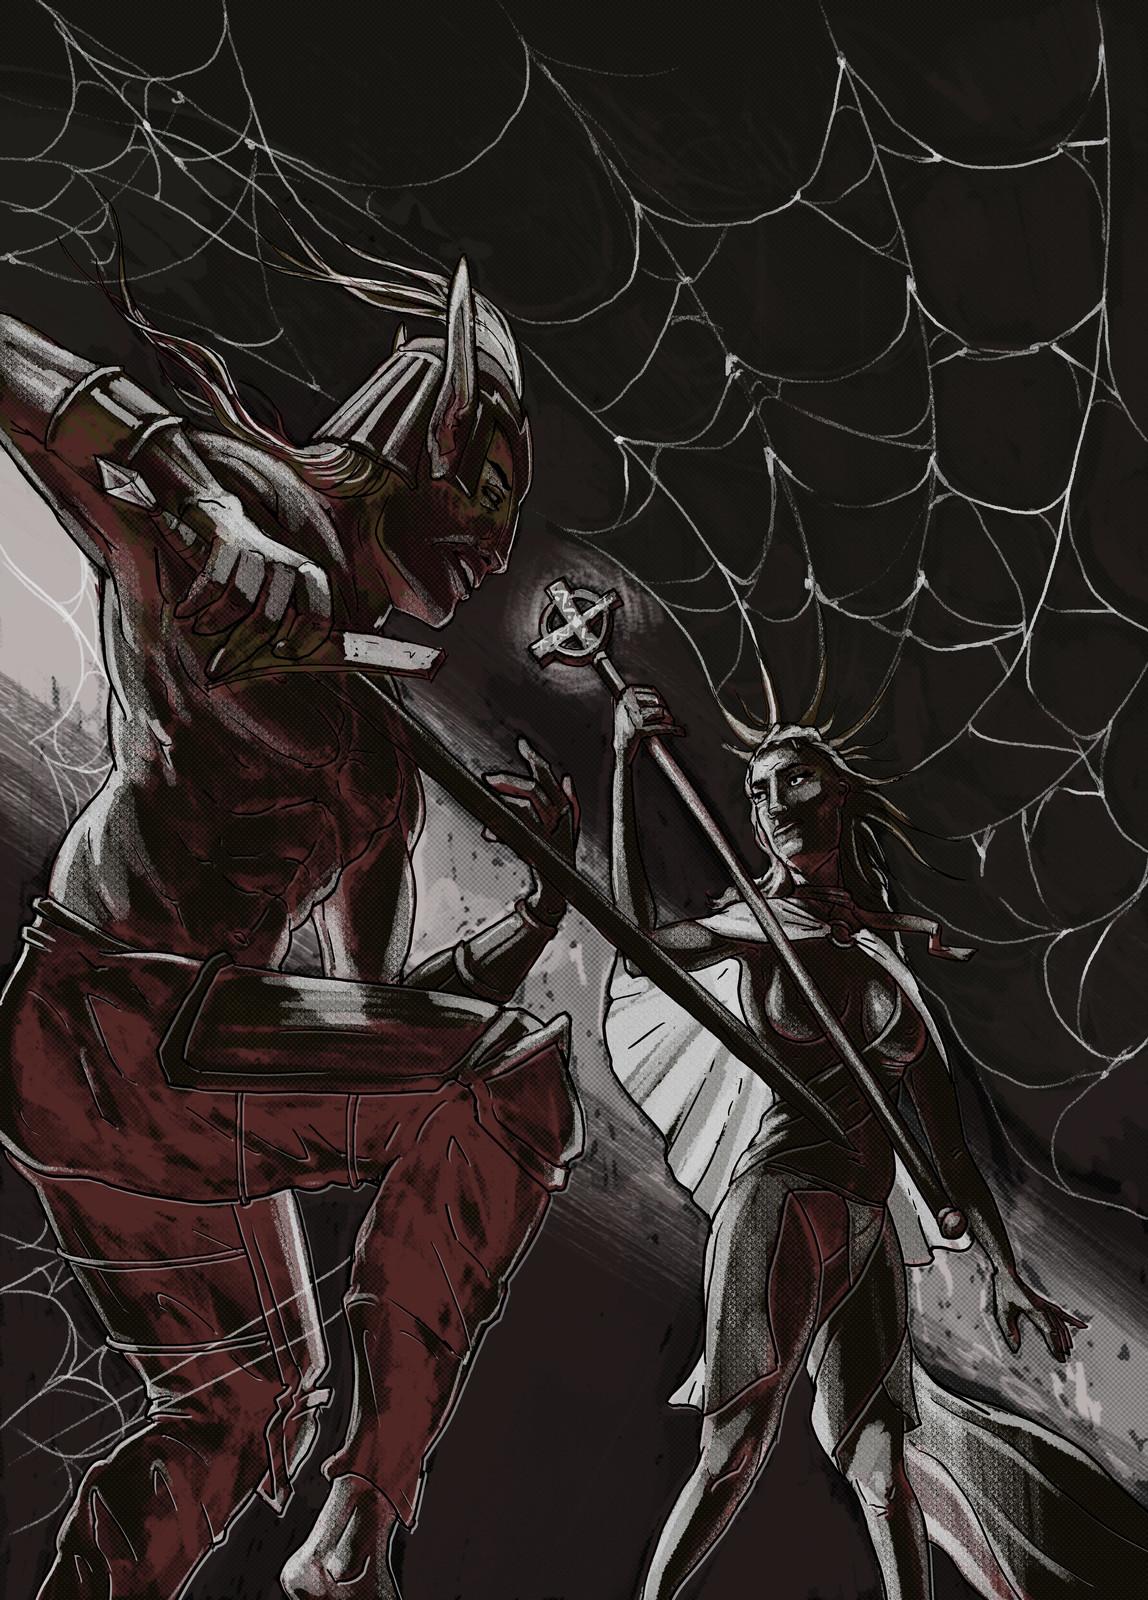 Spider Chess illustration